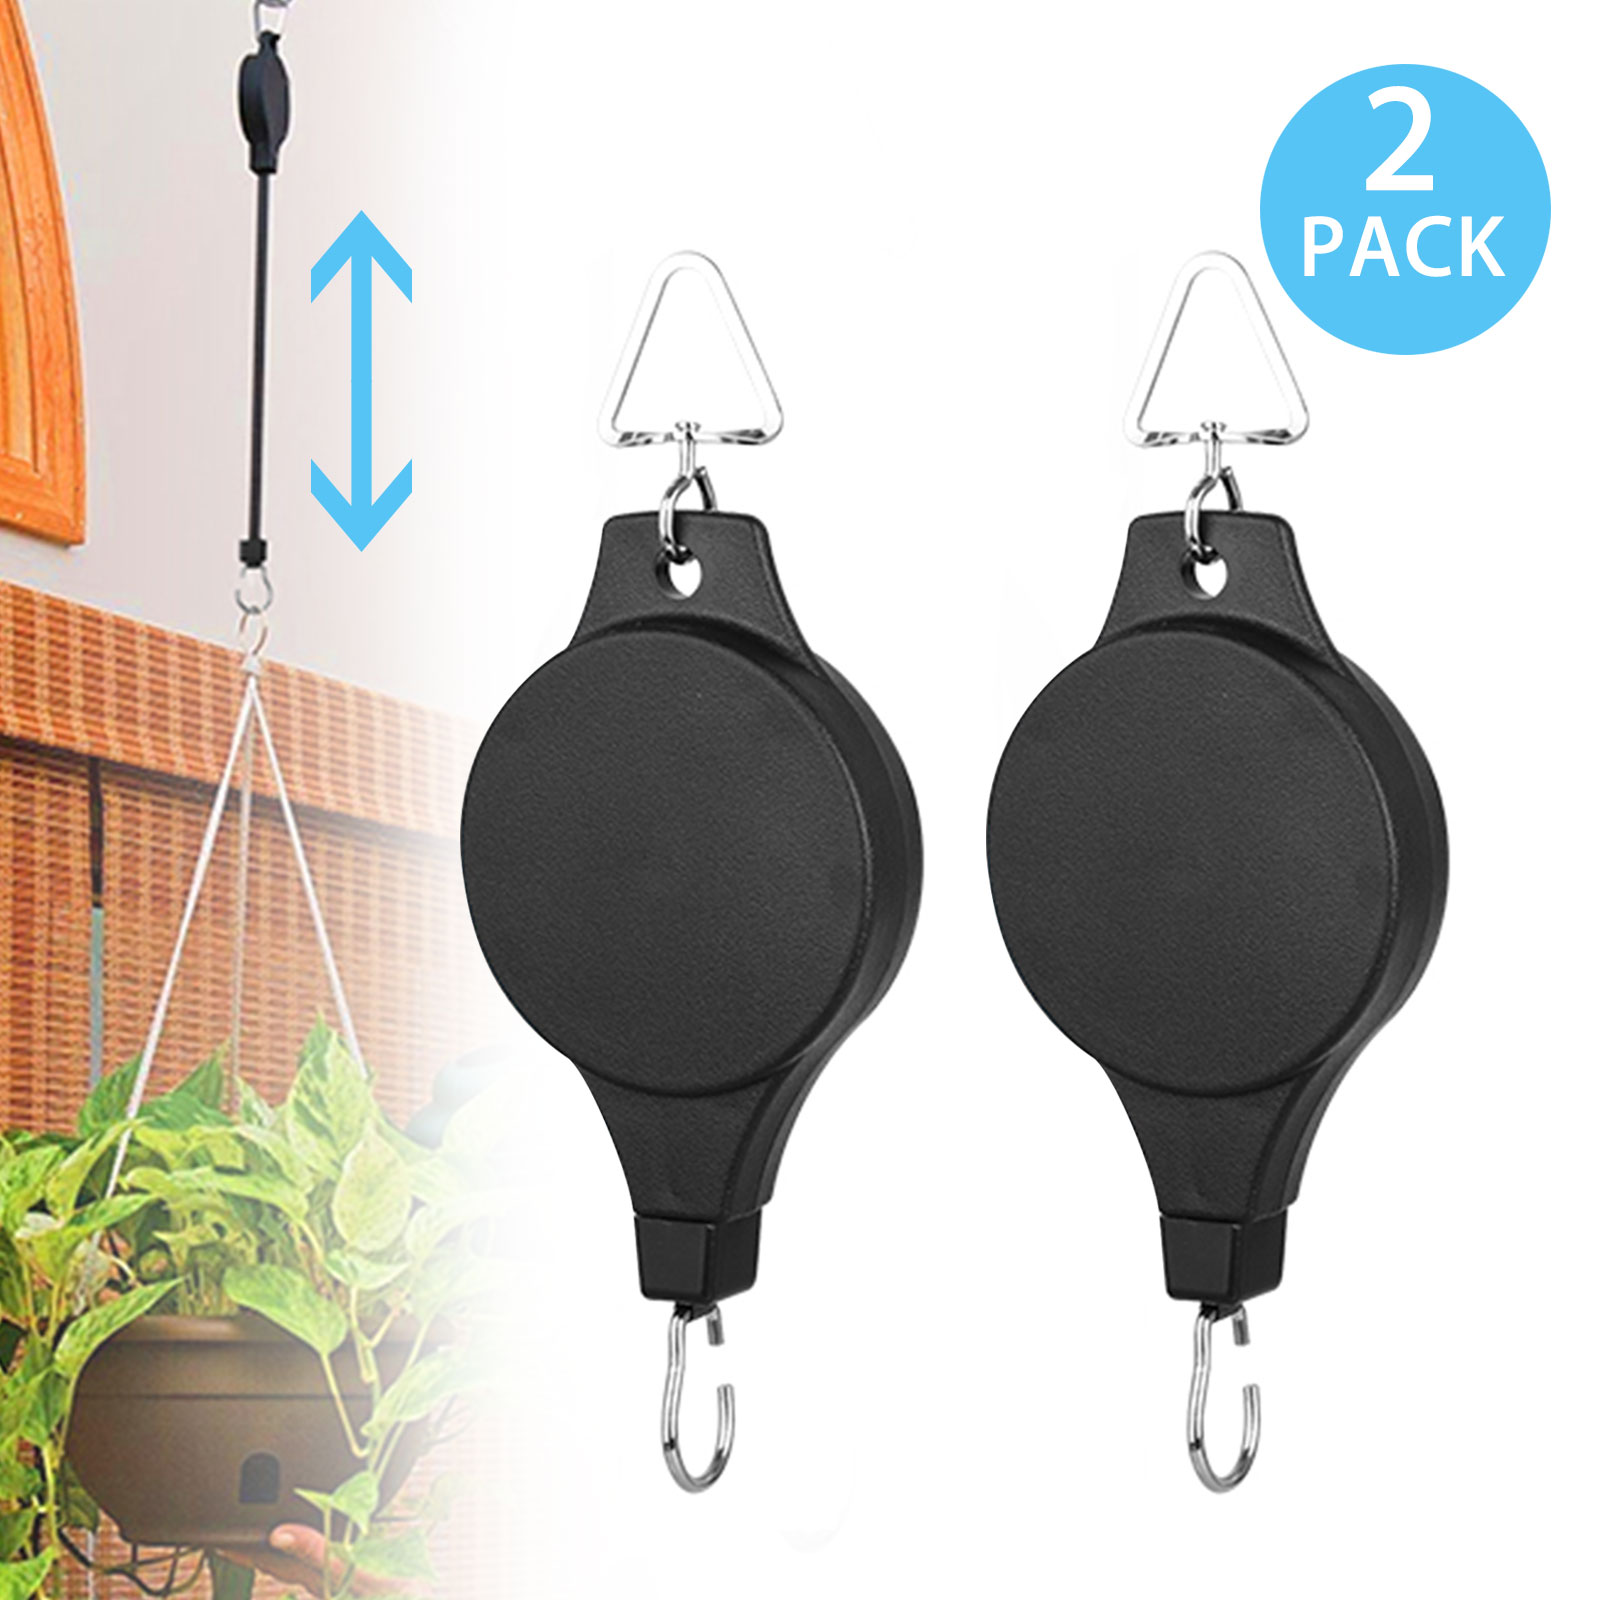 20-pack Plastic Greenhouse Hanging Hooks Flower Hangers Garden Accessories